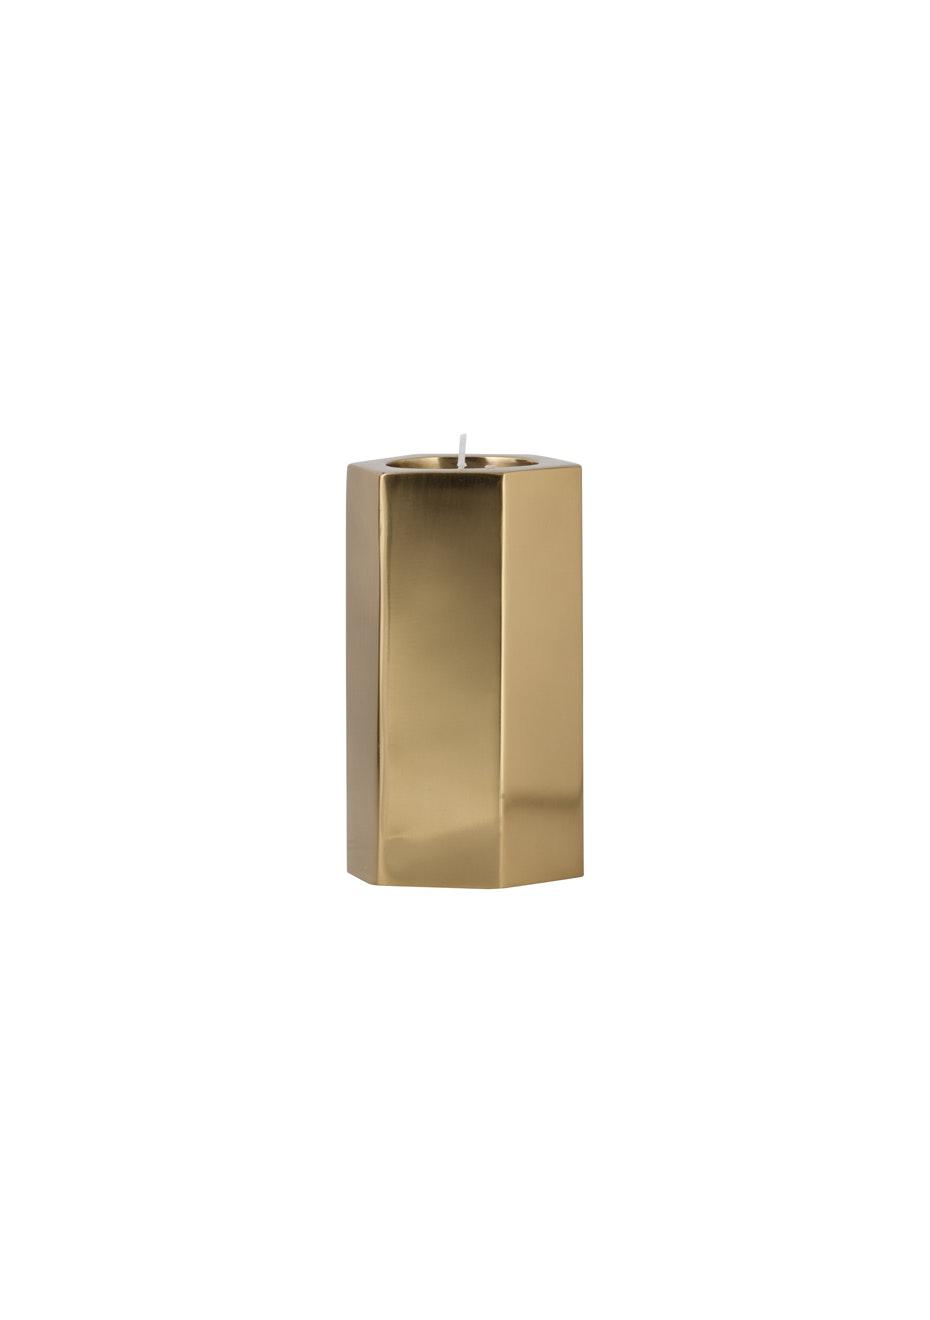 General Eclectic - Hex Tealight Holder Brass Medium